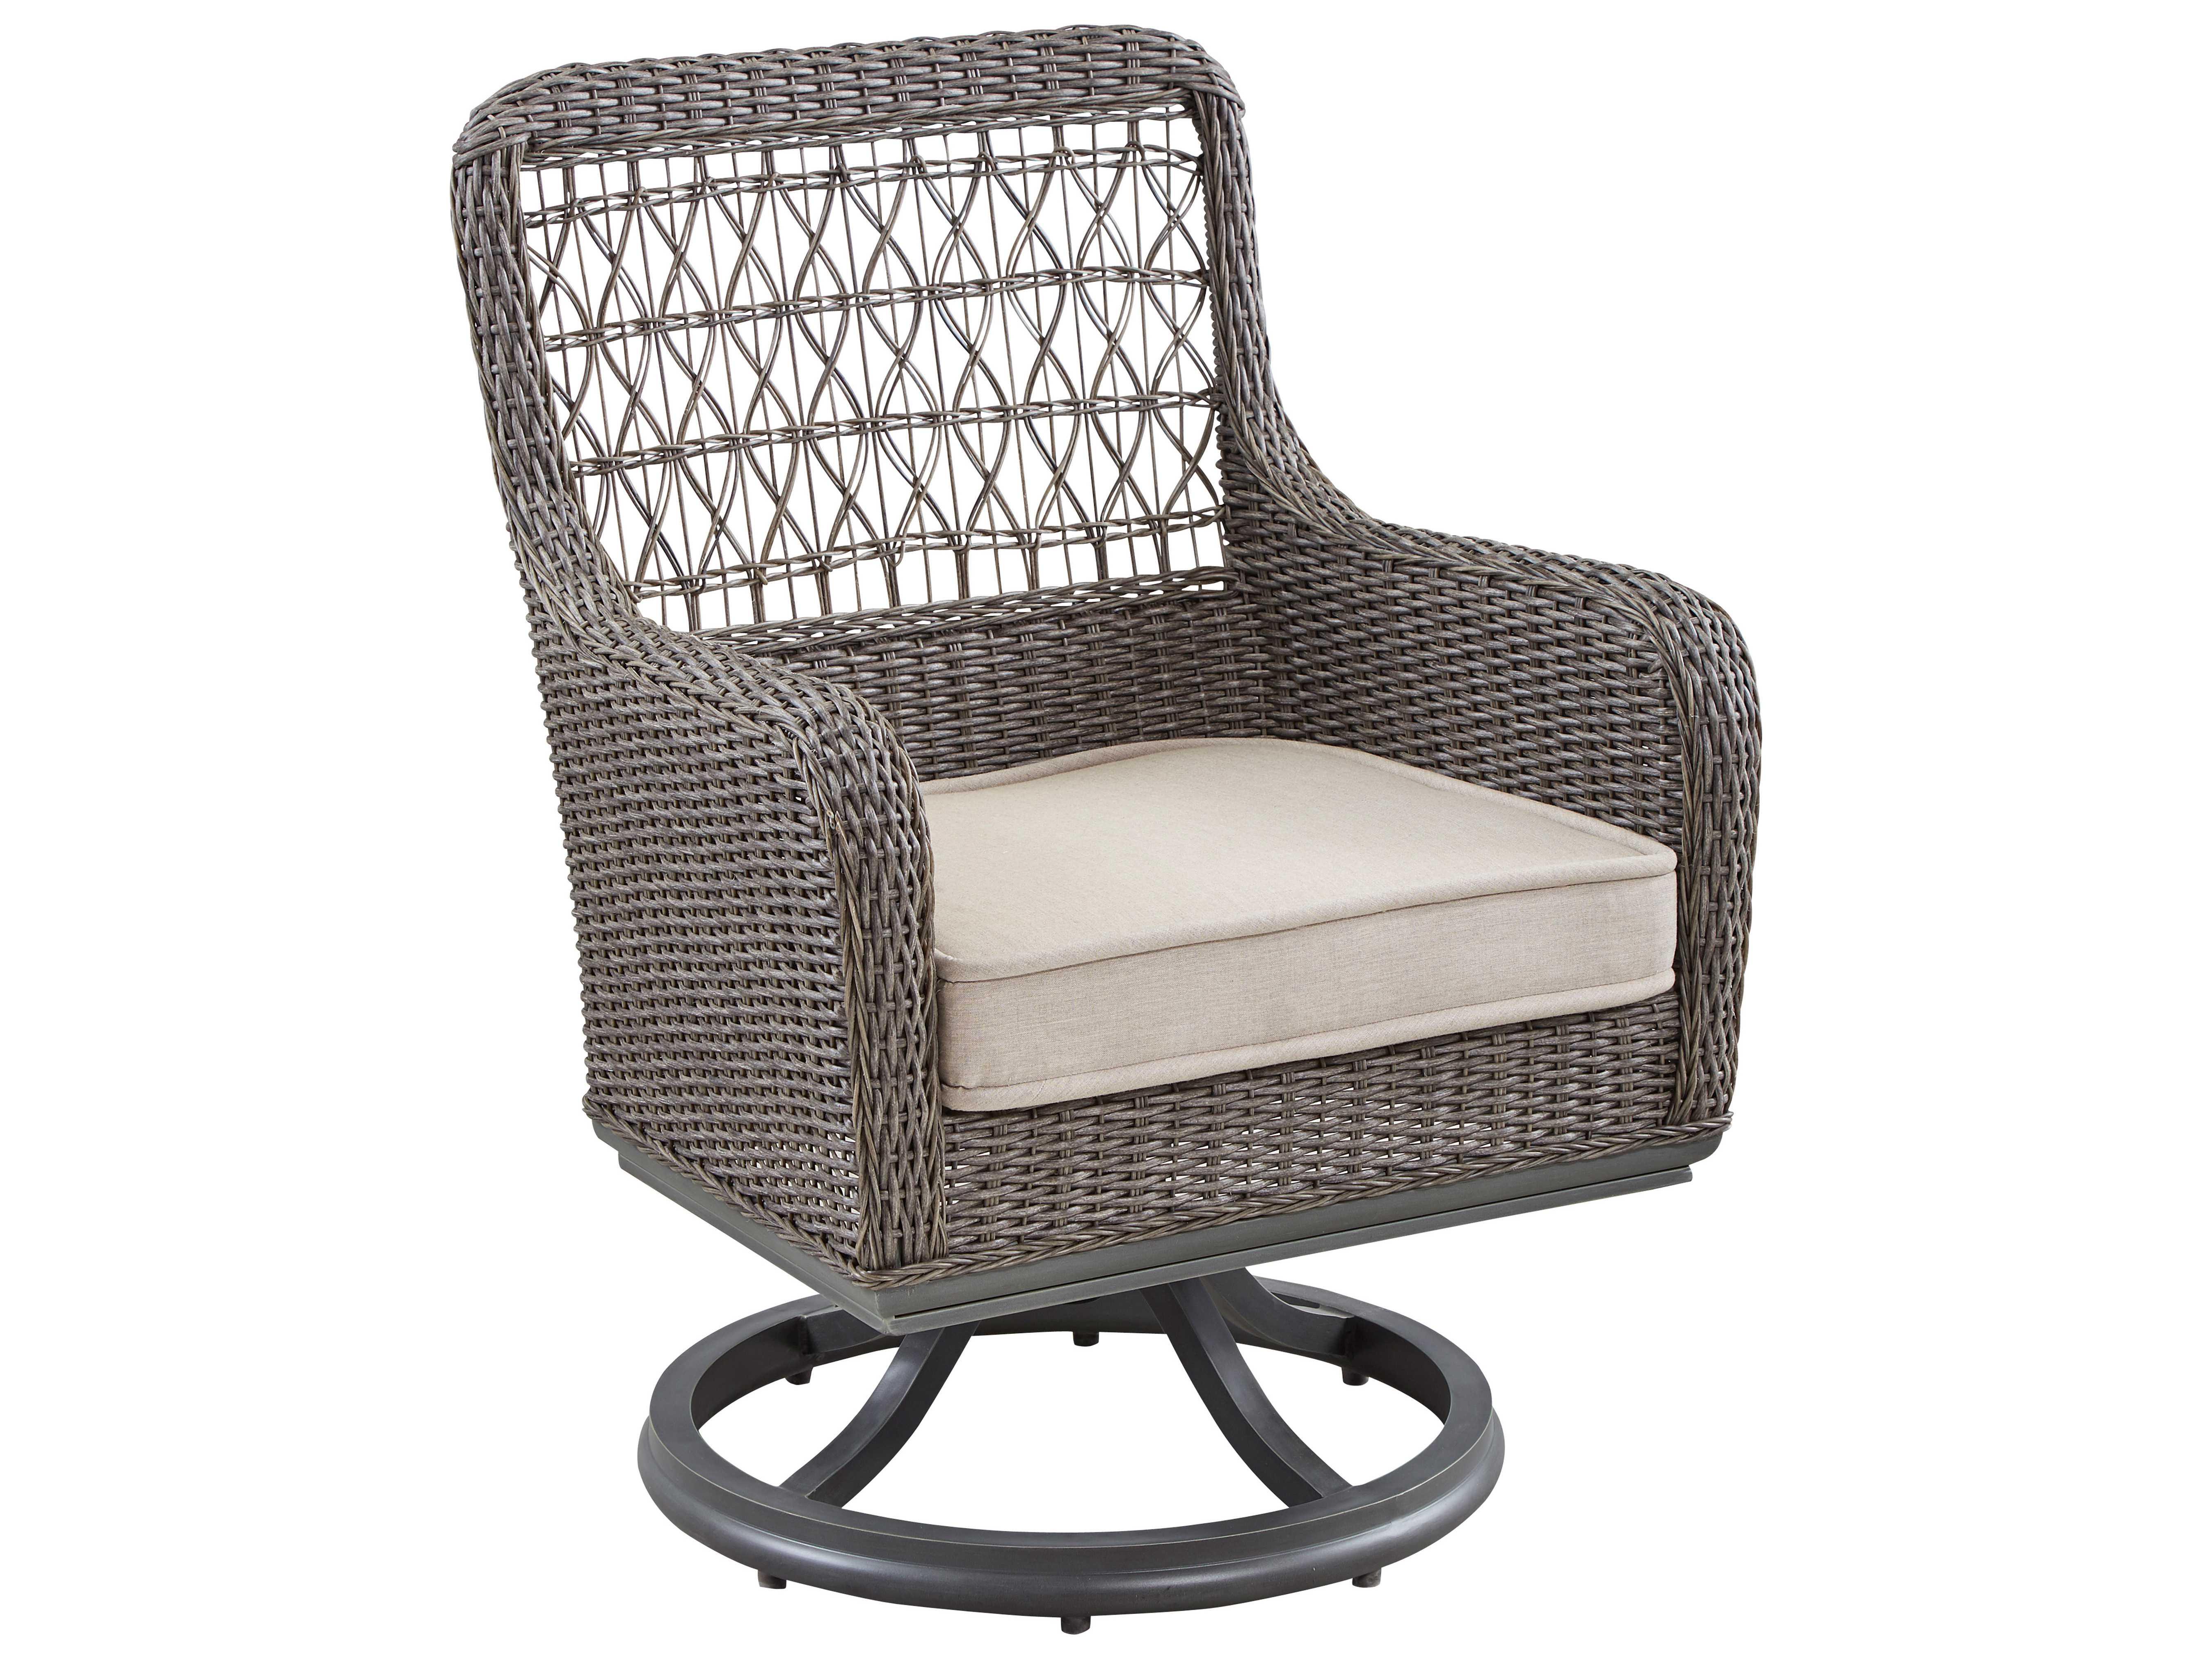 Paula Deen Outdoor Dogwood Wicker Swivel Dining Chair